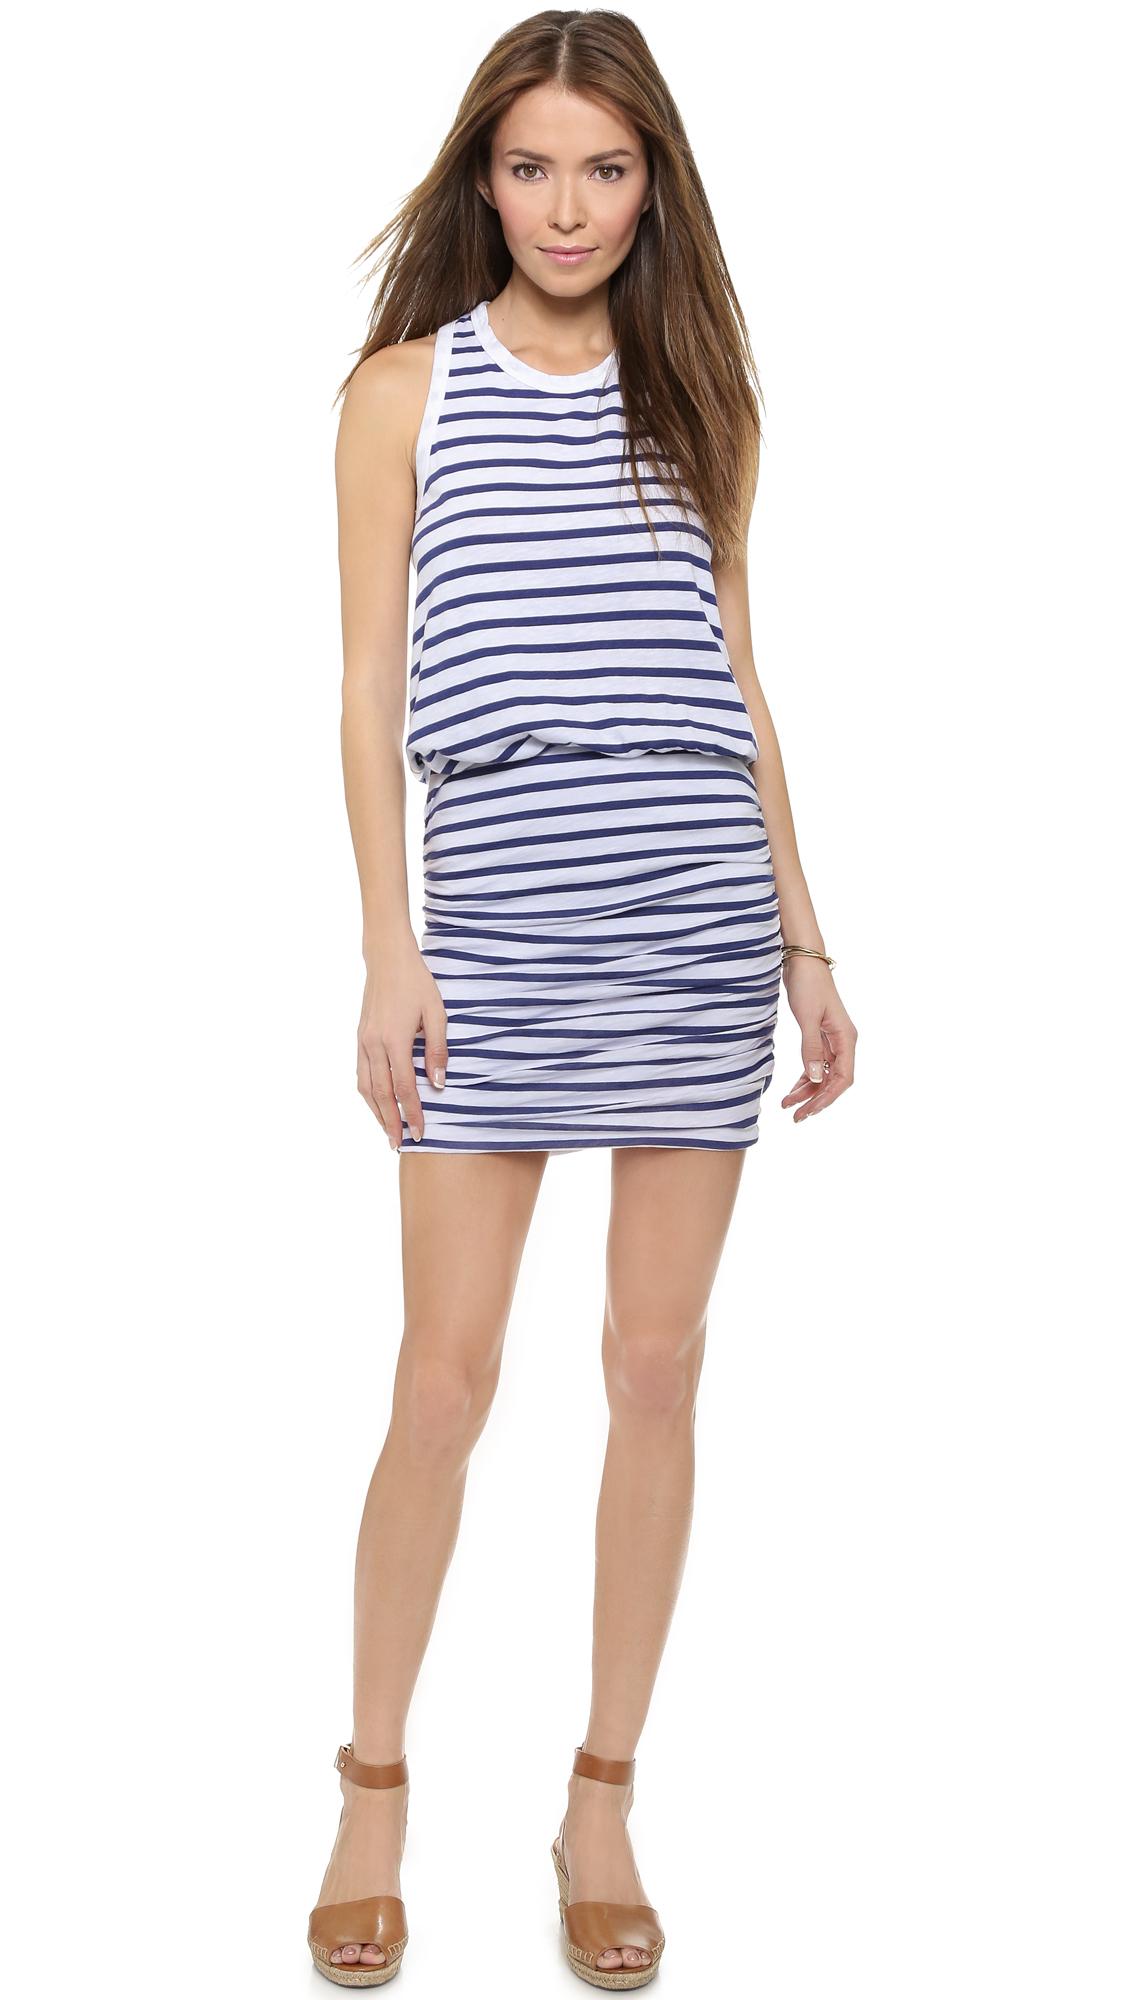 dff5e42ac689f Lyst - Sundry Striped Sleeveless Dress - White in White